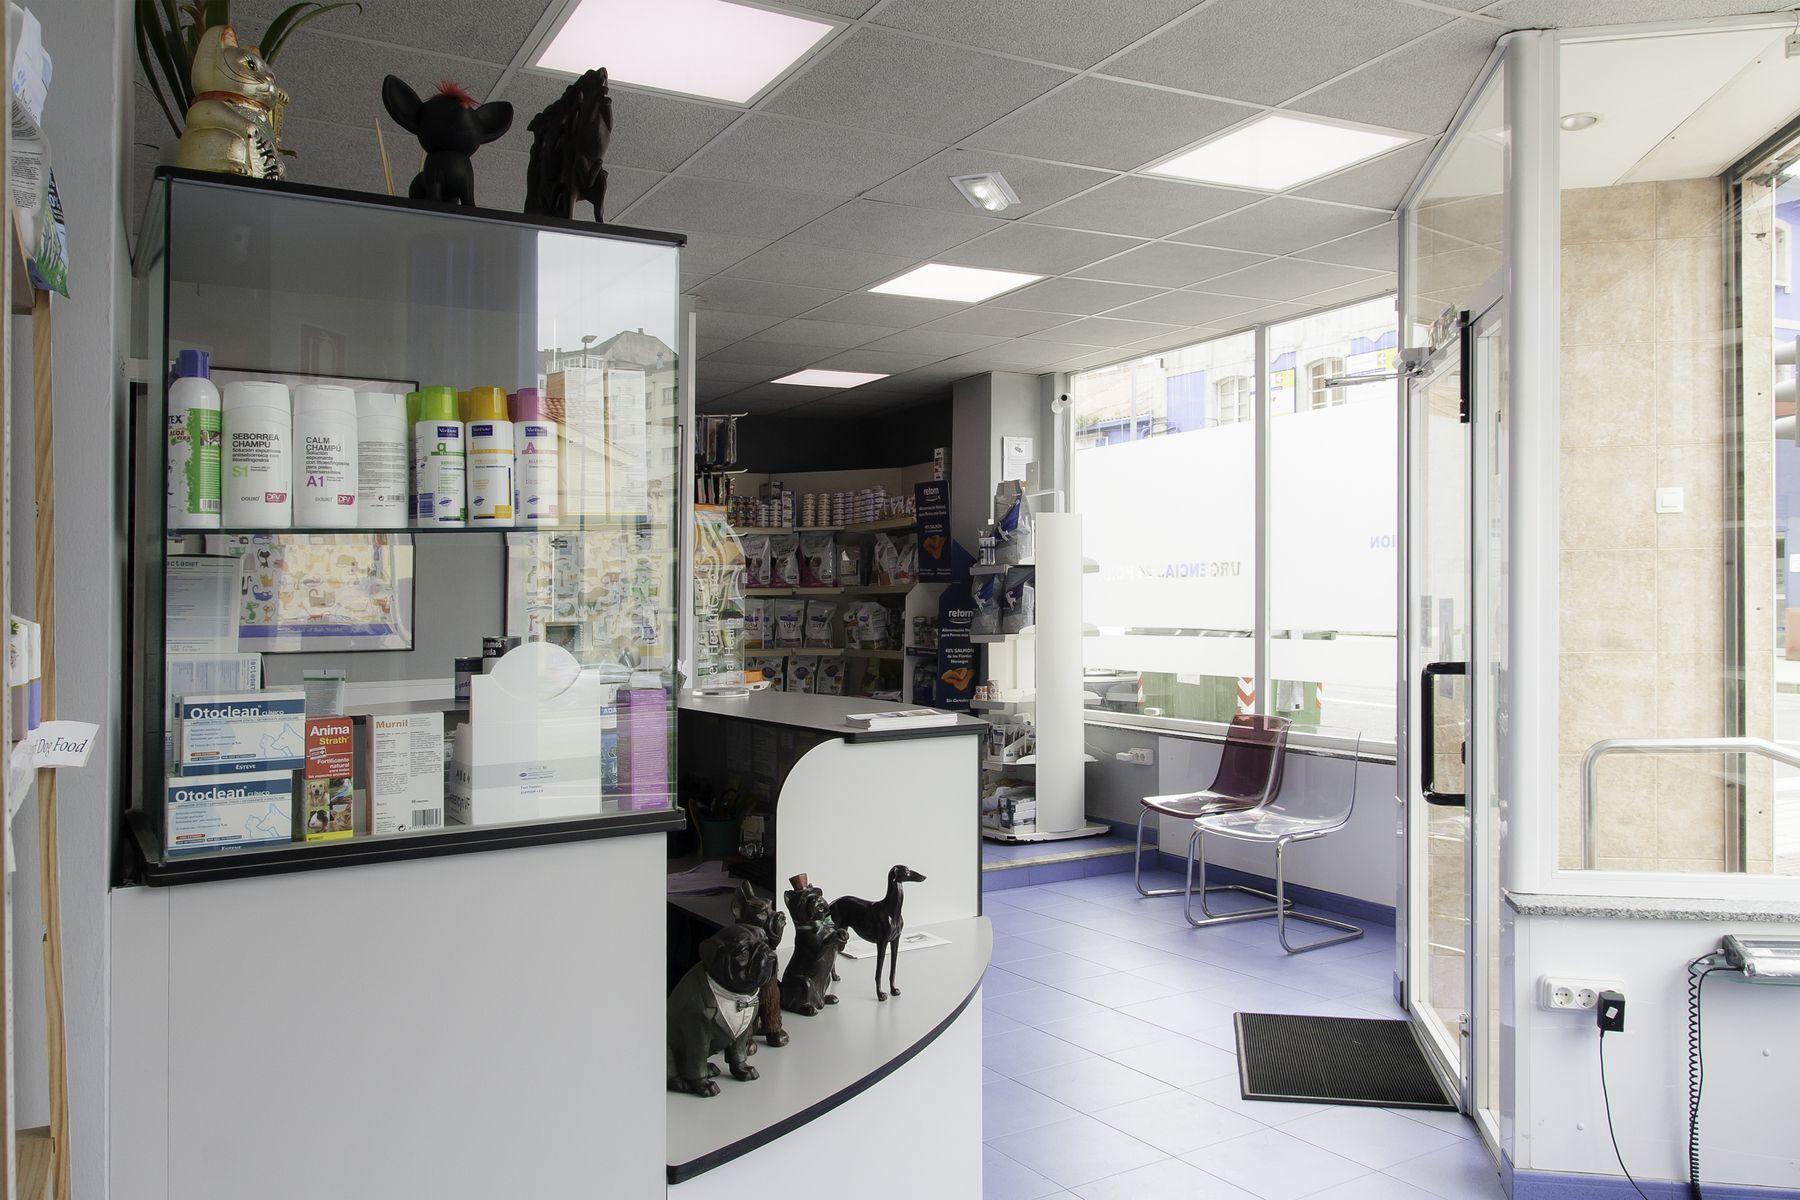 Acupuntura veterinaria en Avilés